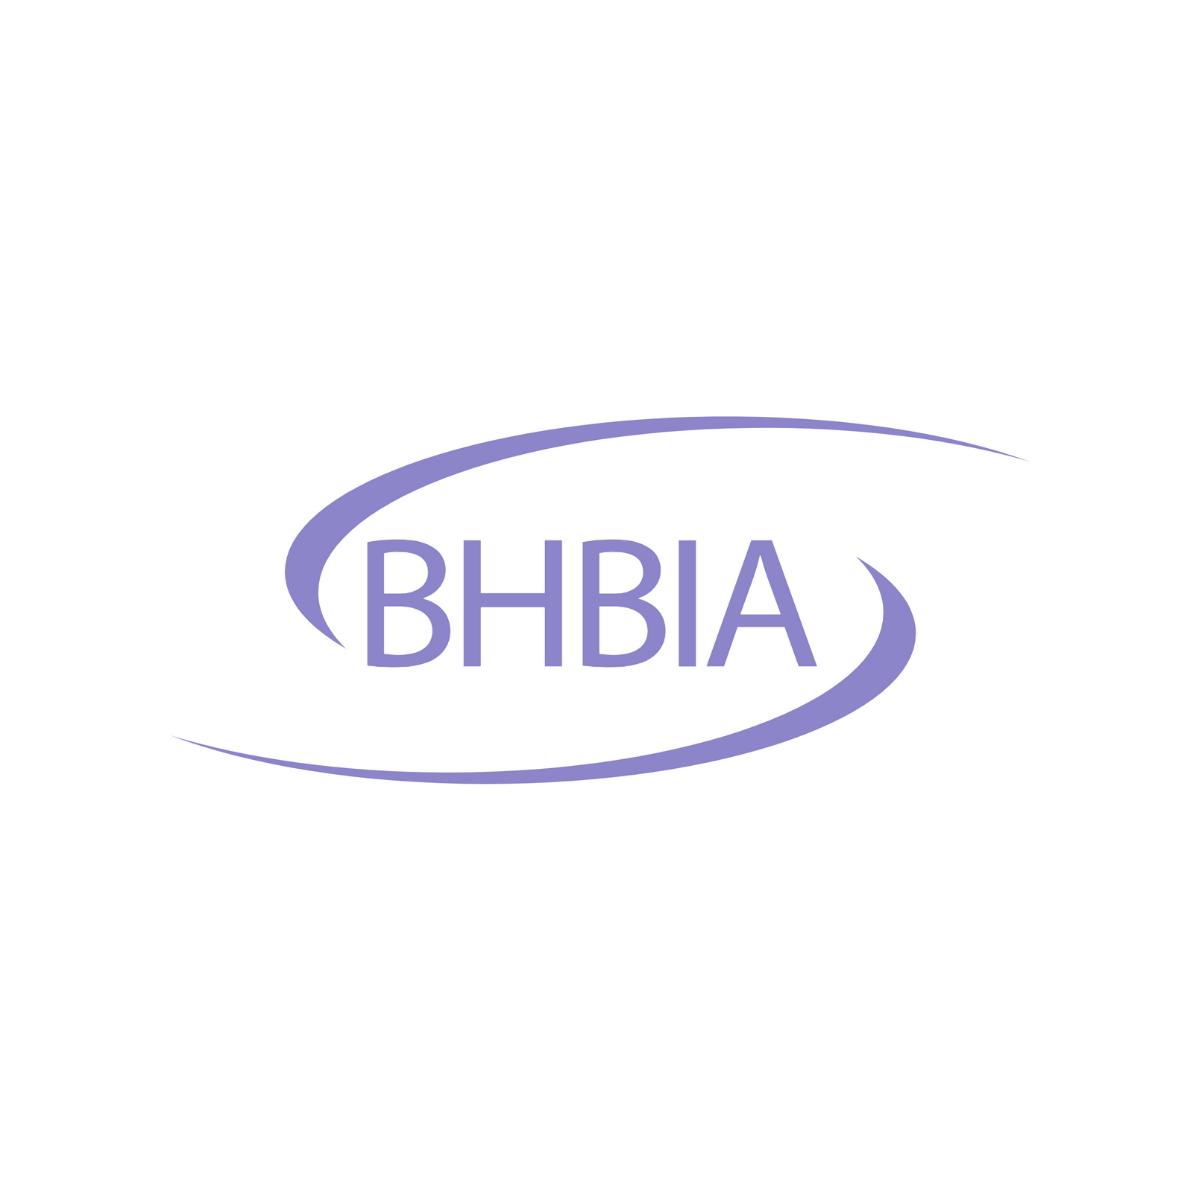 Convosphere Webinar with BHBIA